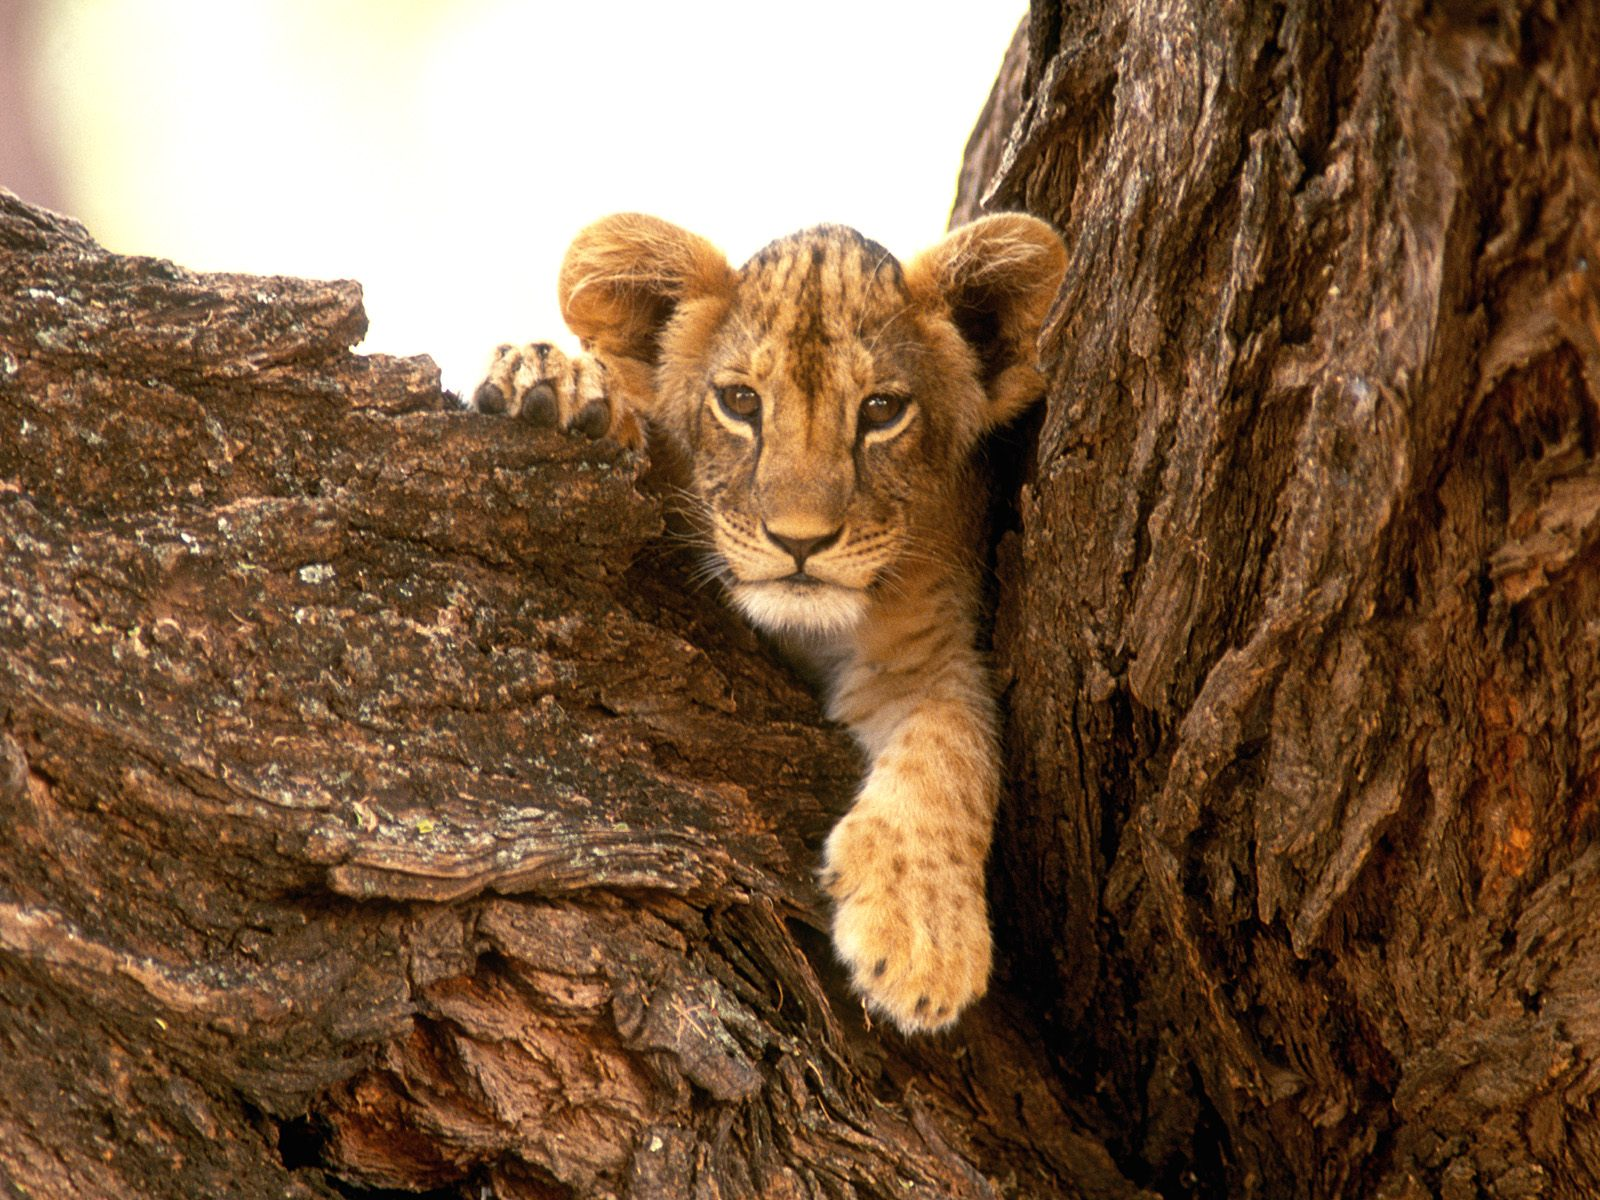 http://2.bp.blogspot.com/-U4zPfJryGRU/T-6SxxGU5FI/AAAAAAAACrg/BWYzw9CJ-Cg/s1600/Tiny++Lion+Wallpapers.jpg